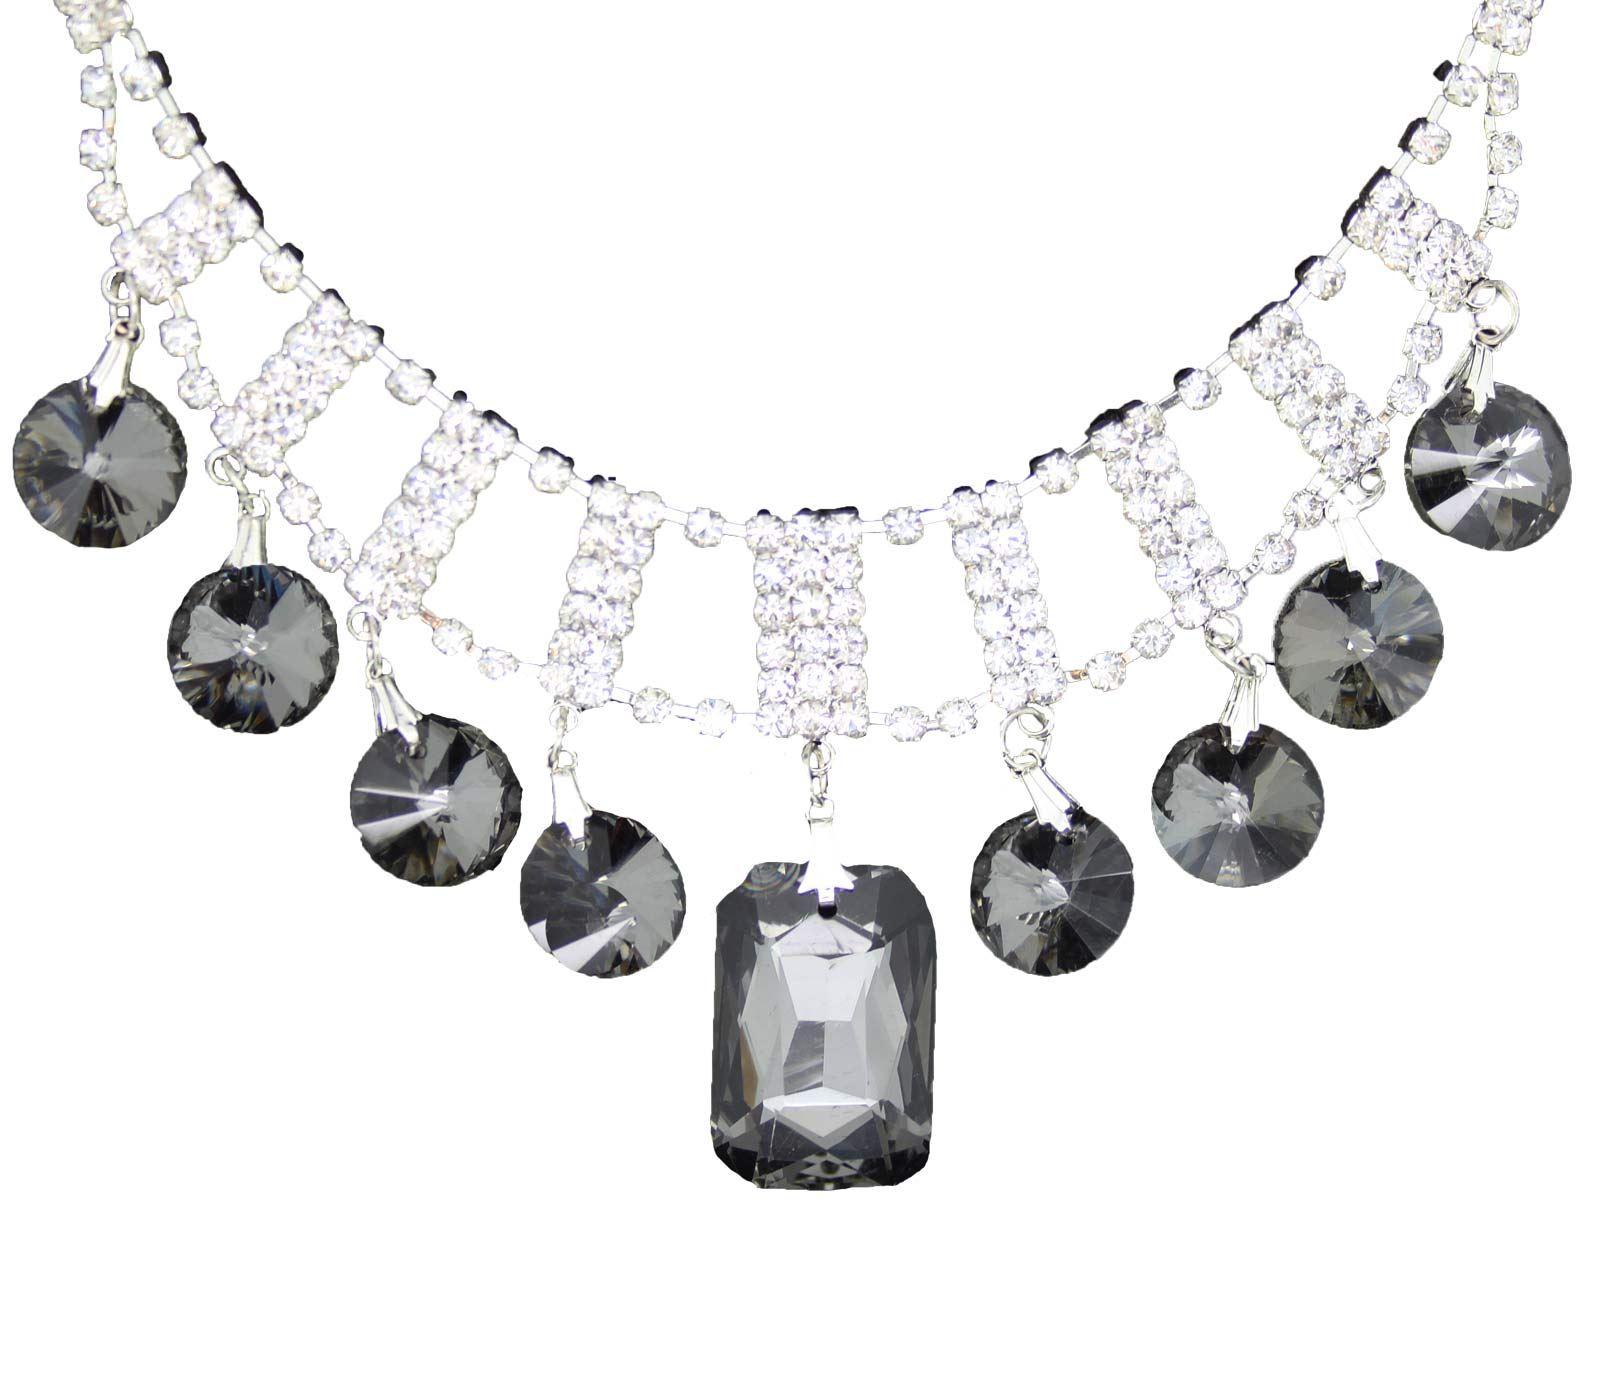 True-Face-Ladies-Women-039-s-Elegant-Earrings-Necklace-Set-Metal-Alloy-Jewellery thumbnail 30